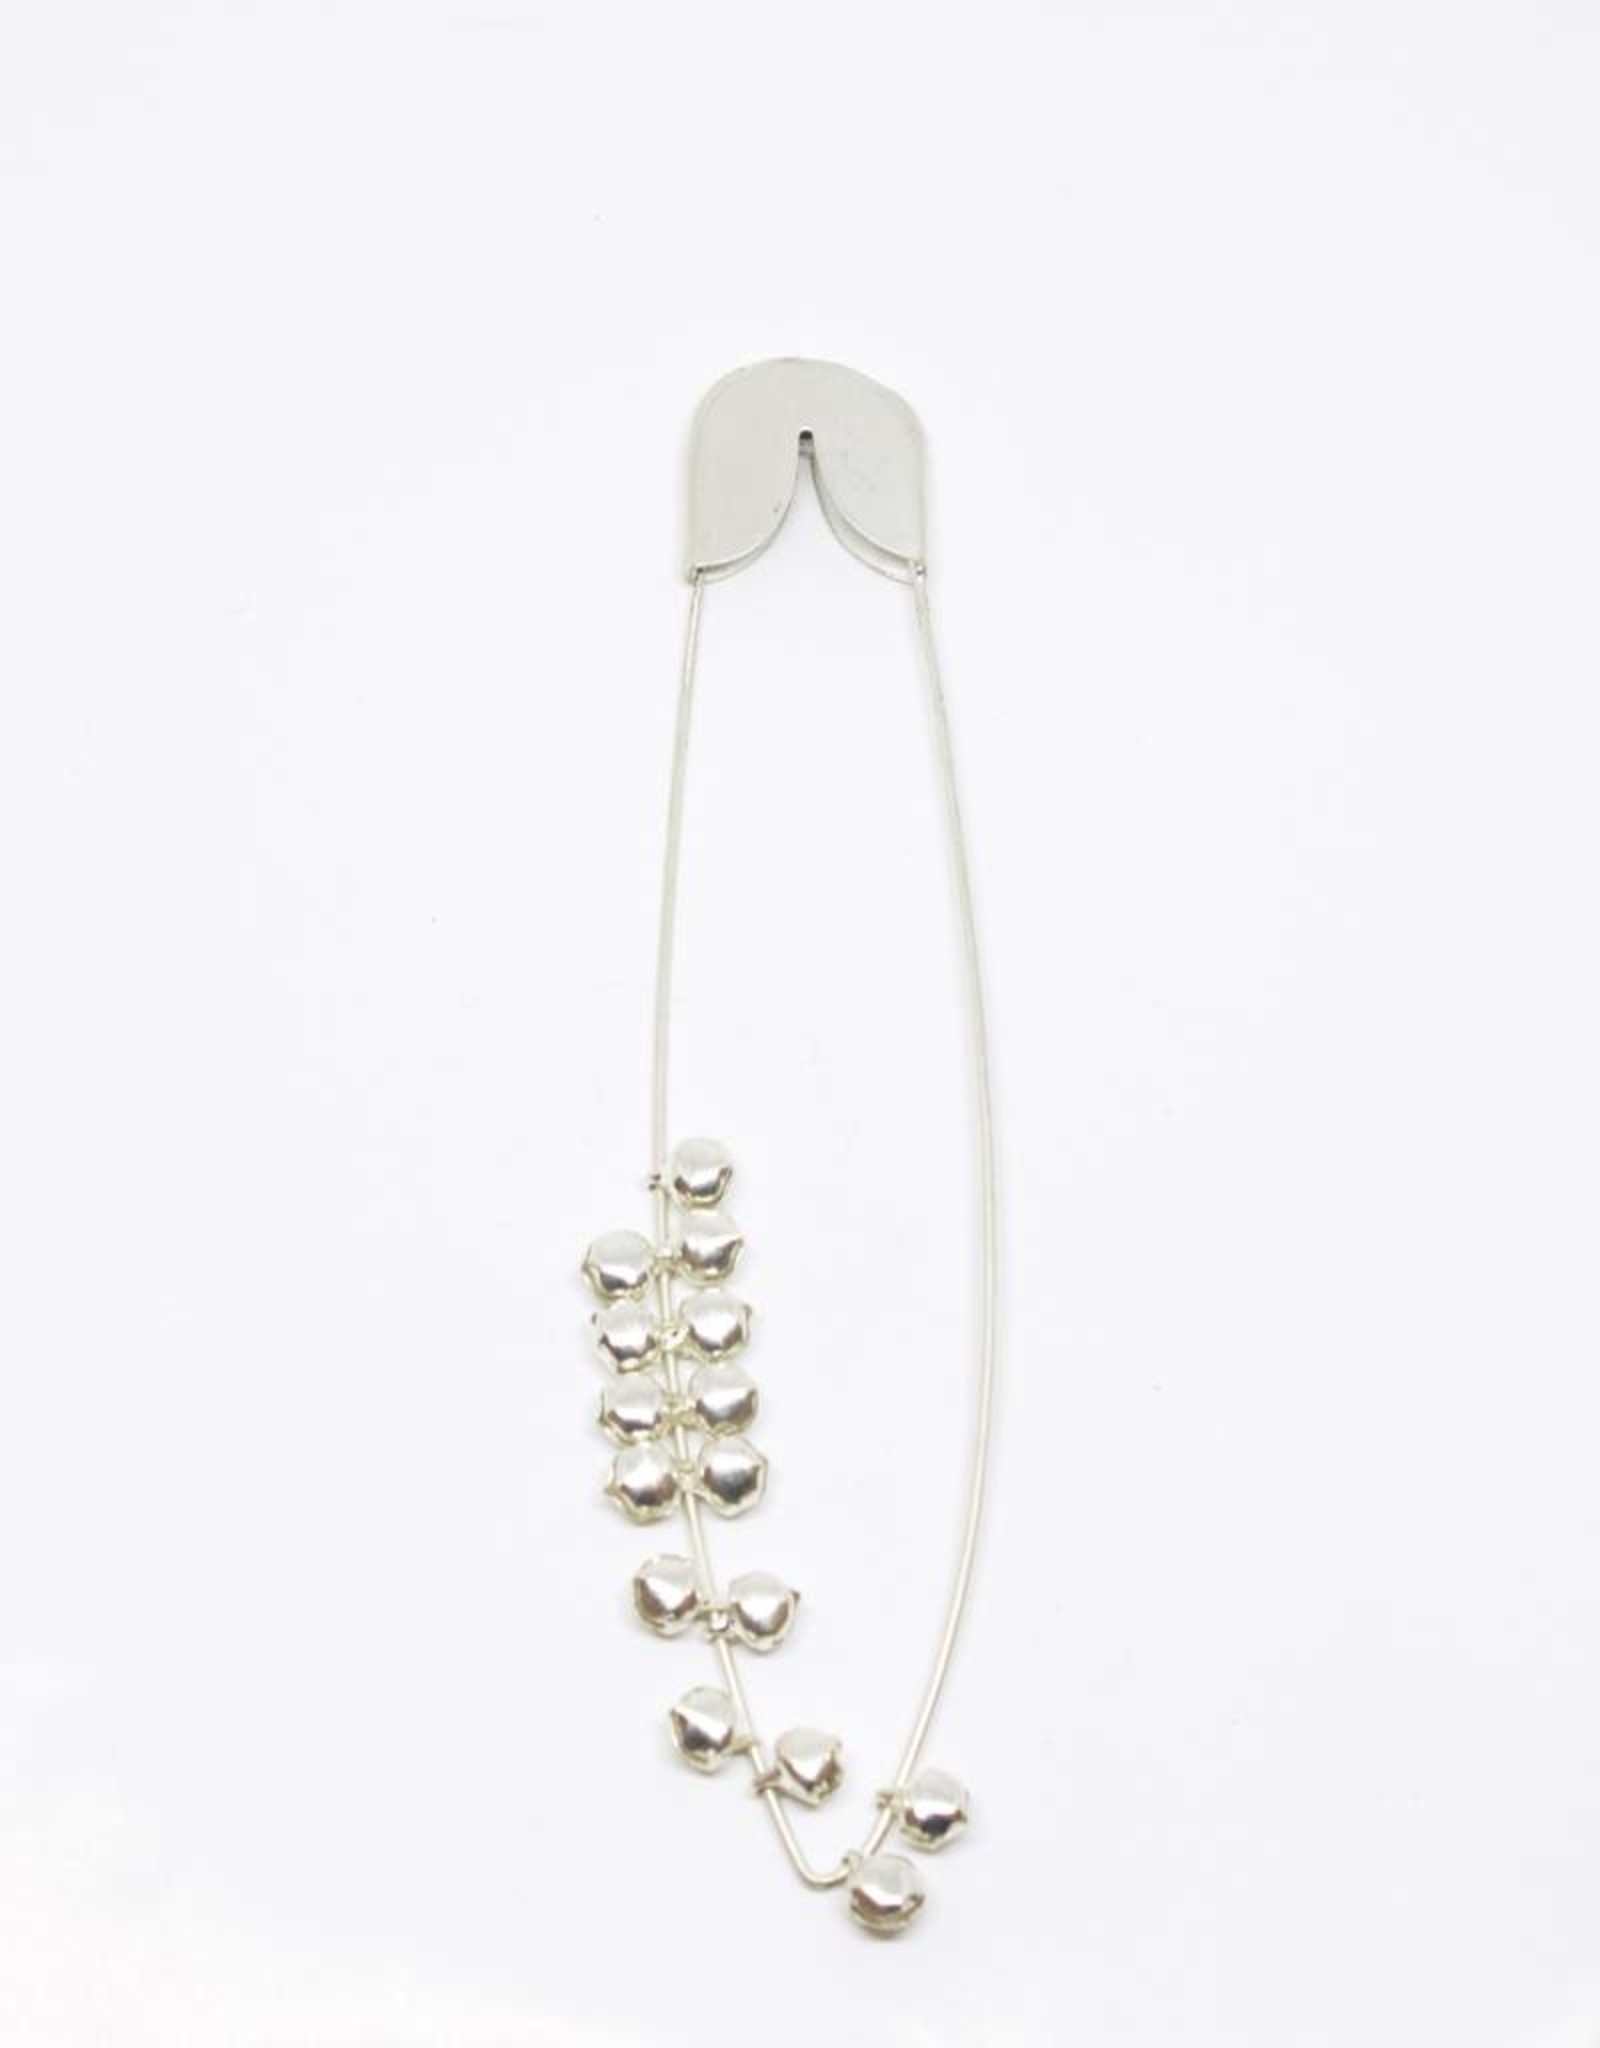 Fog Linen Silver Safety Pin with Bells - Medium